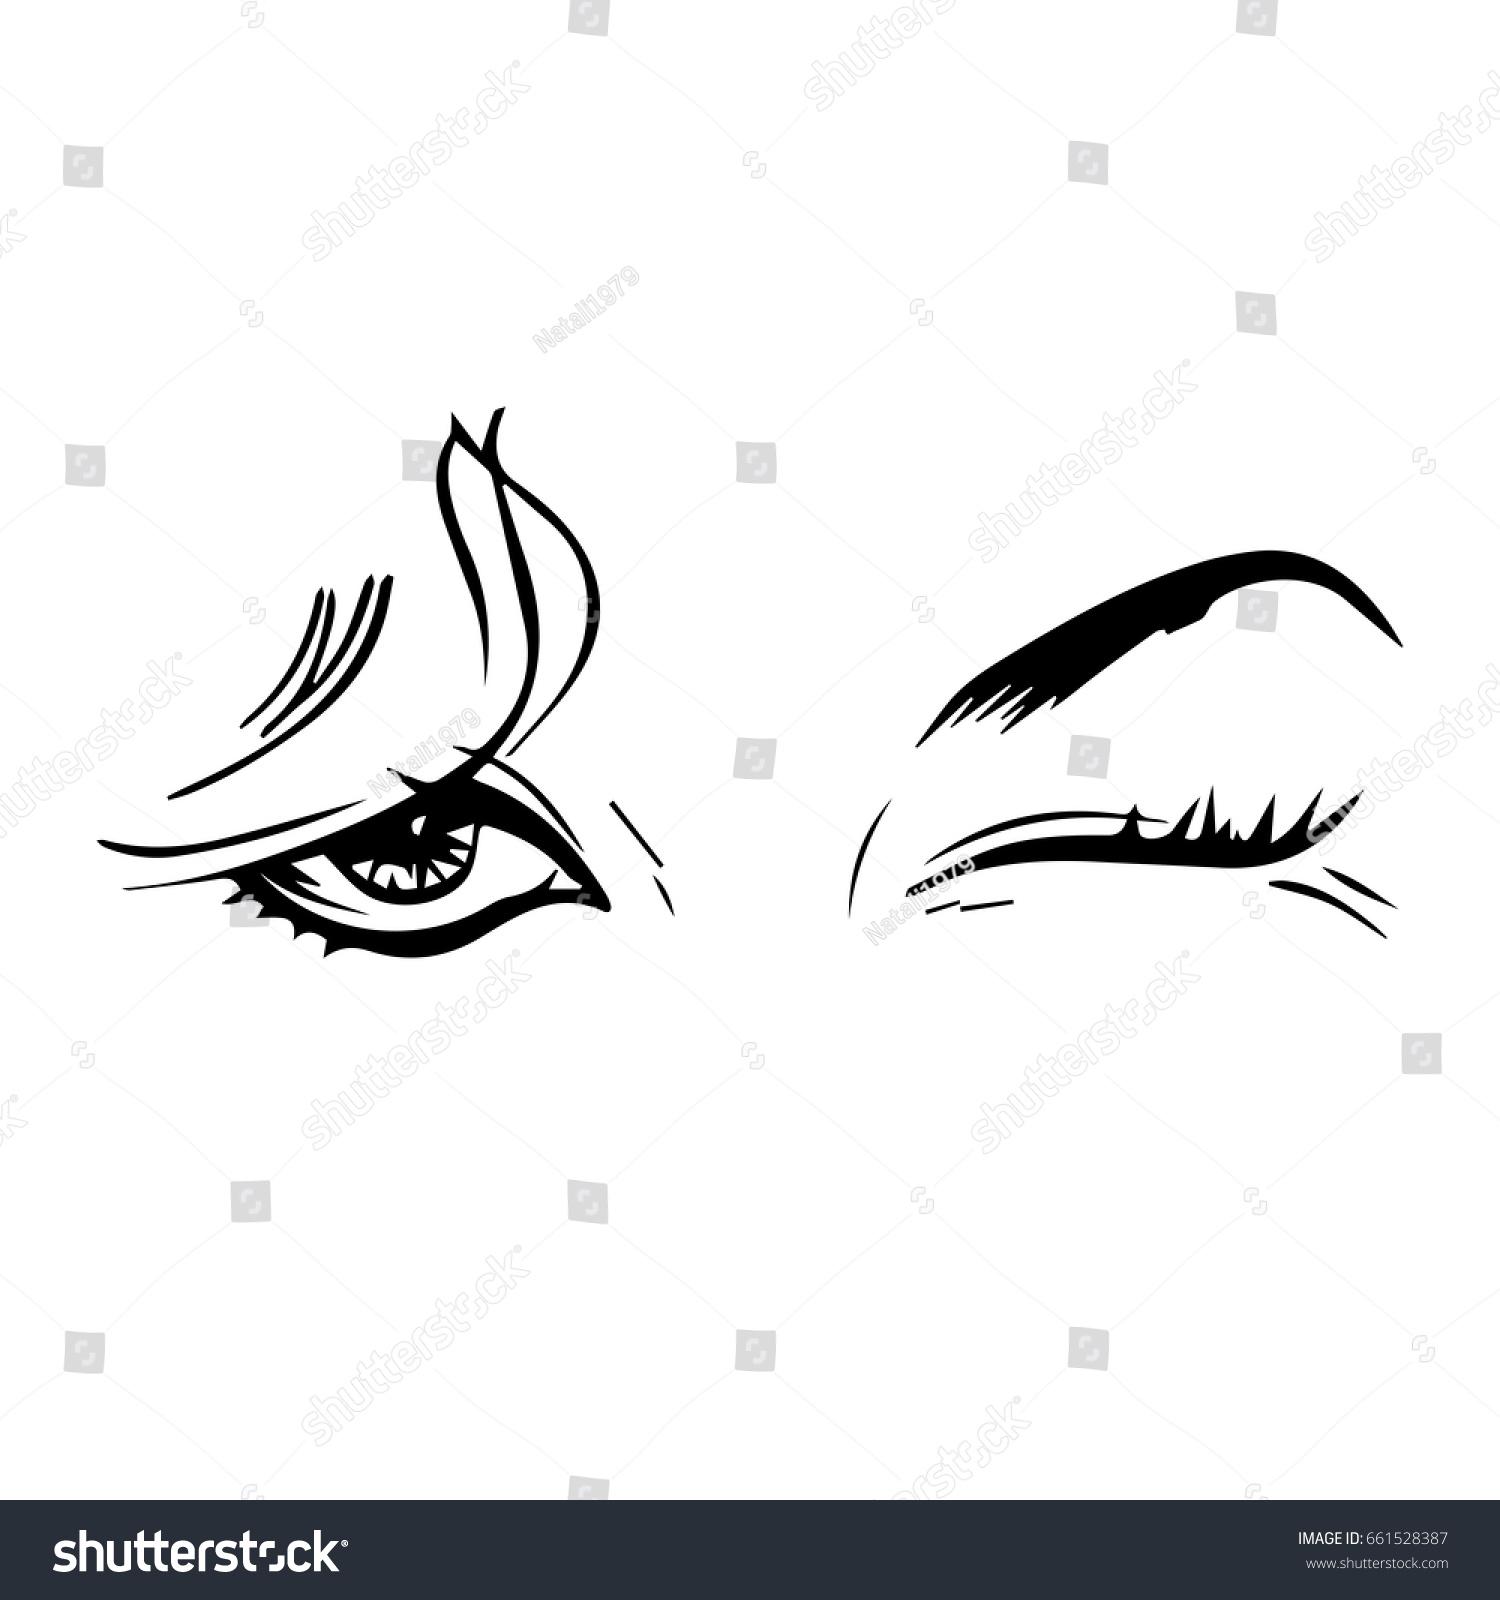 silhouette female eyes winked stock vector royalty free 661528387 rh shutterstock com Man Winking Clip Art Man Winking Clip Art